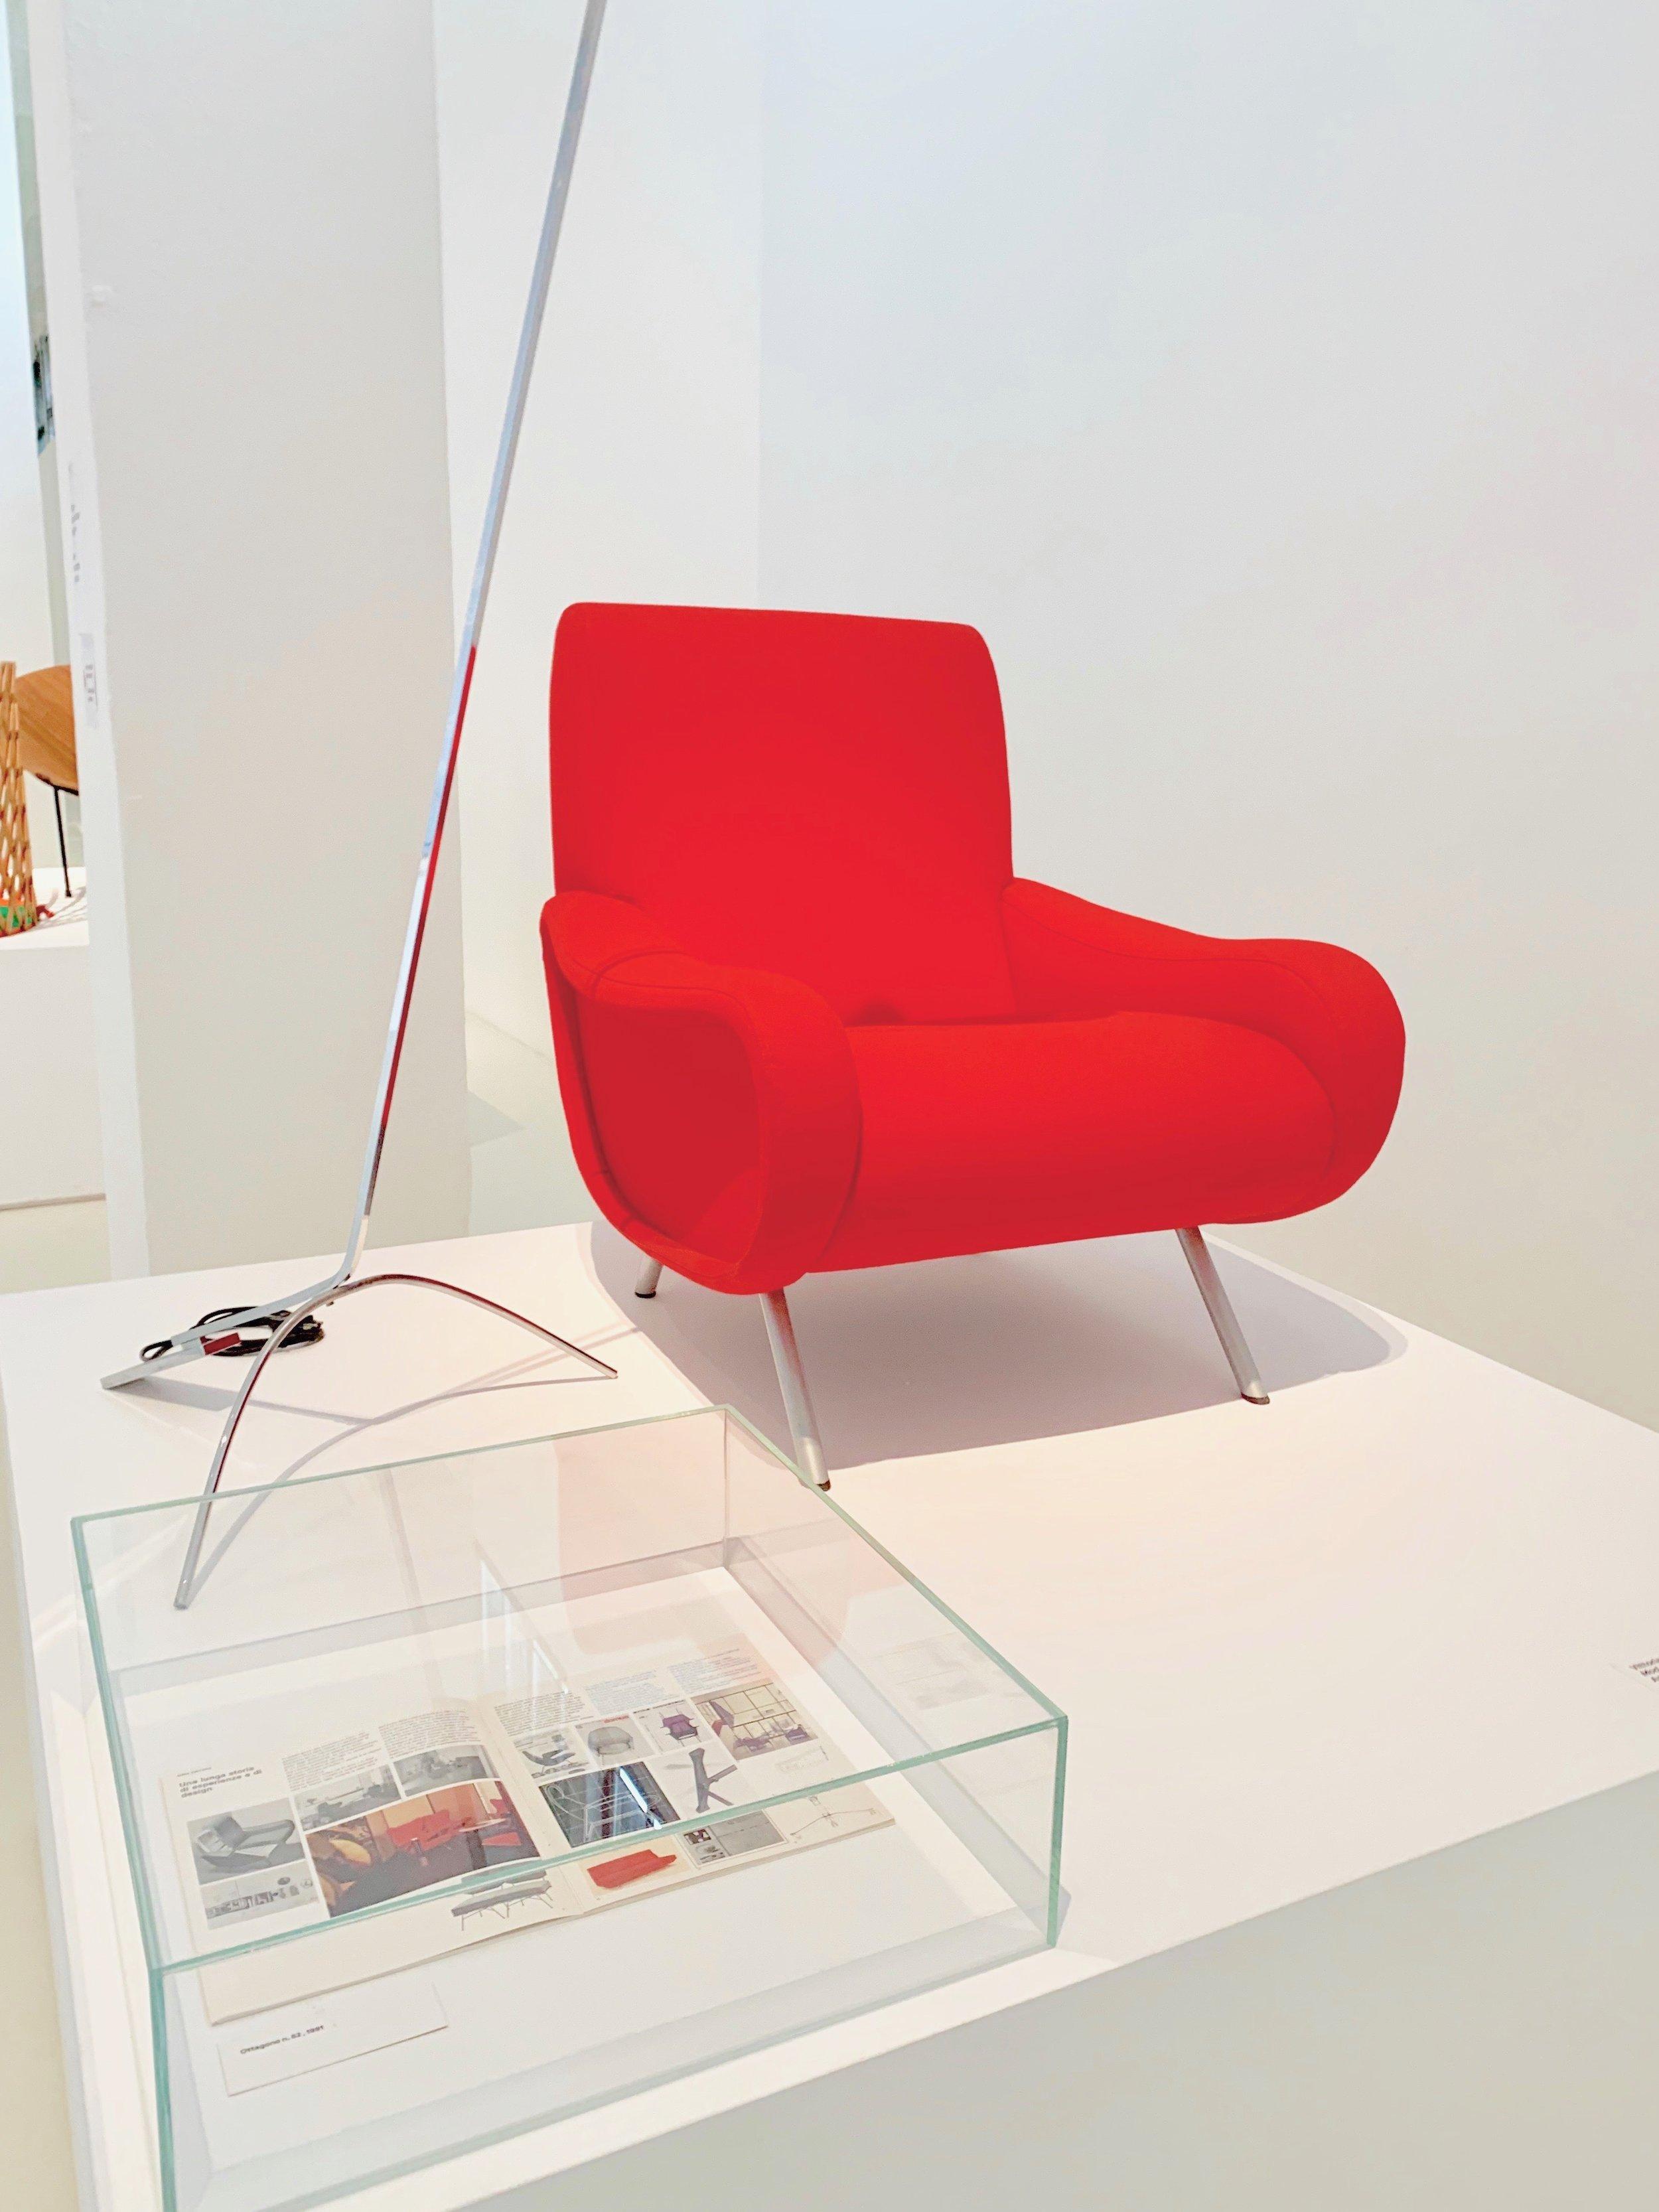 Museum Of Italian Design - Italian Mid Century Modern Furniture Designitalia00005.jpeg